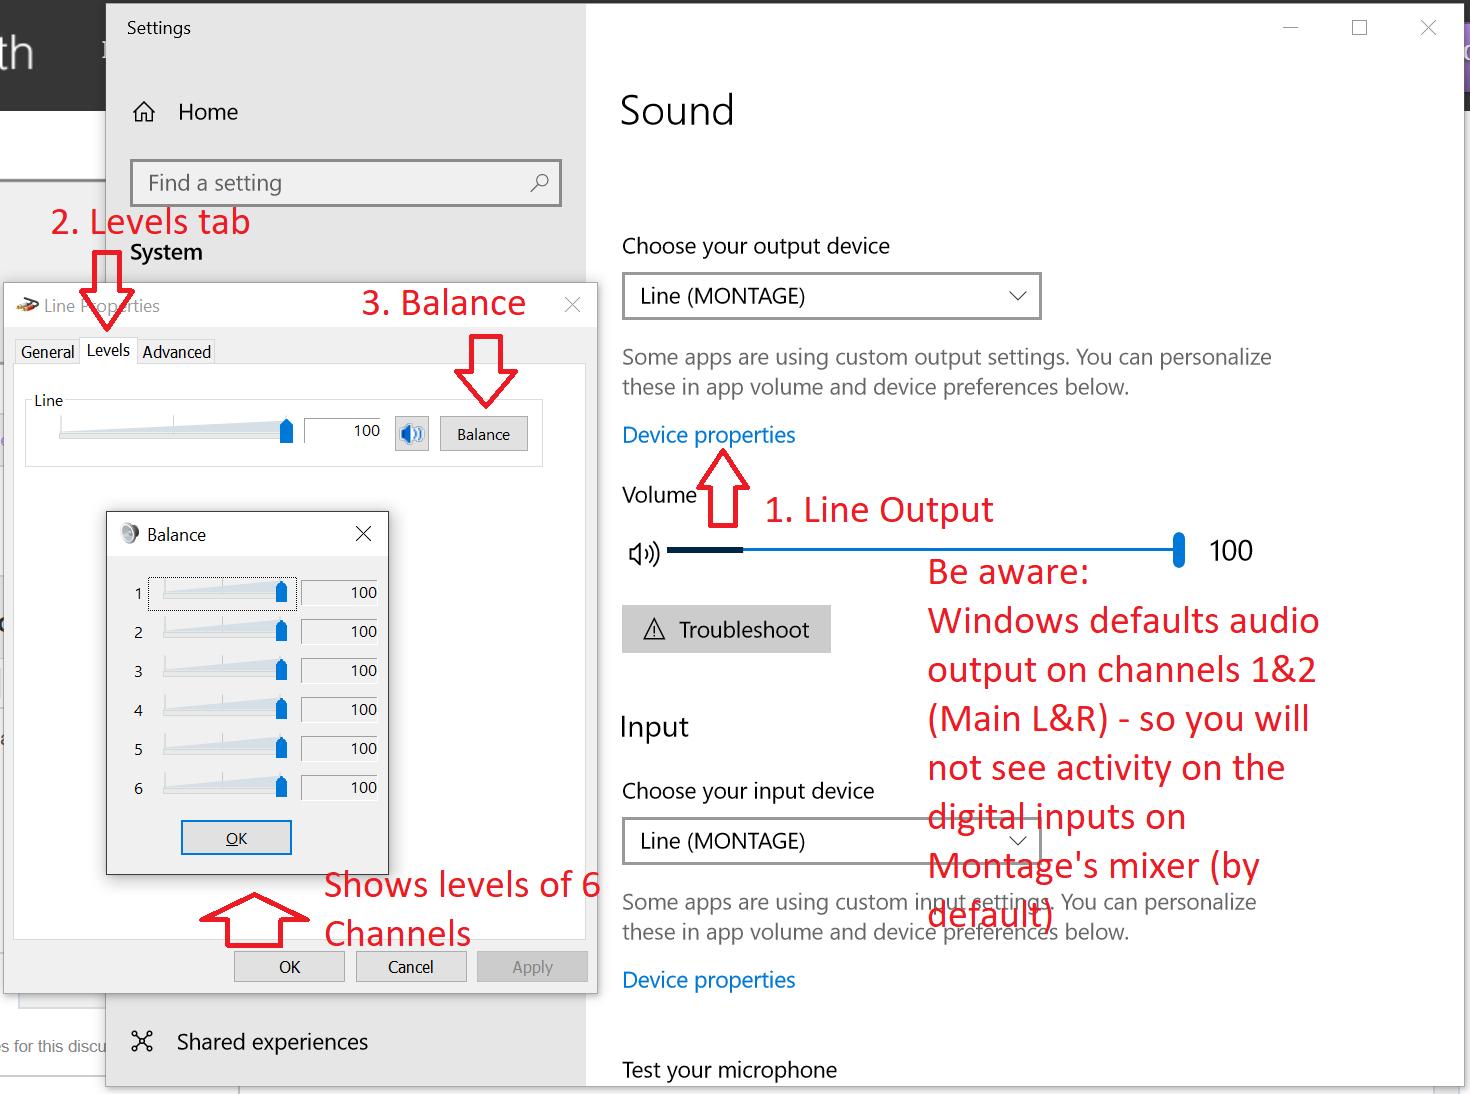 https://image.ibb.co/b2eCDy/Windows_Audio_Settings.png